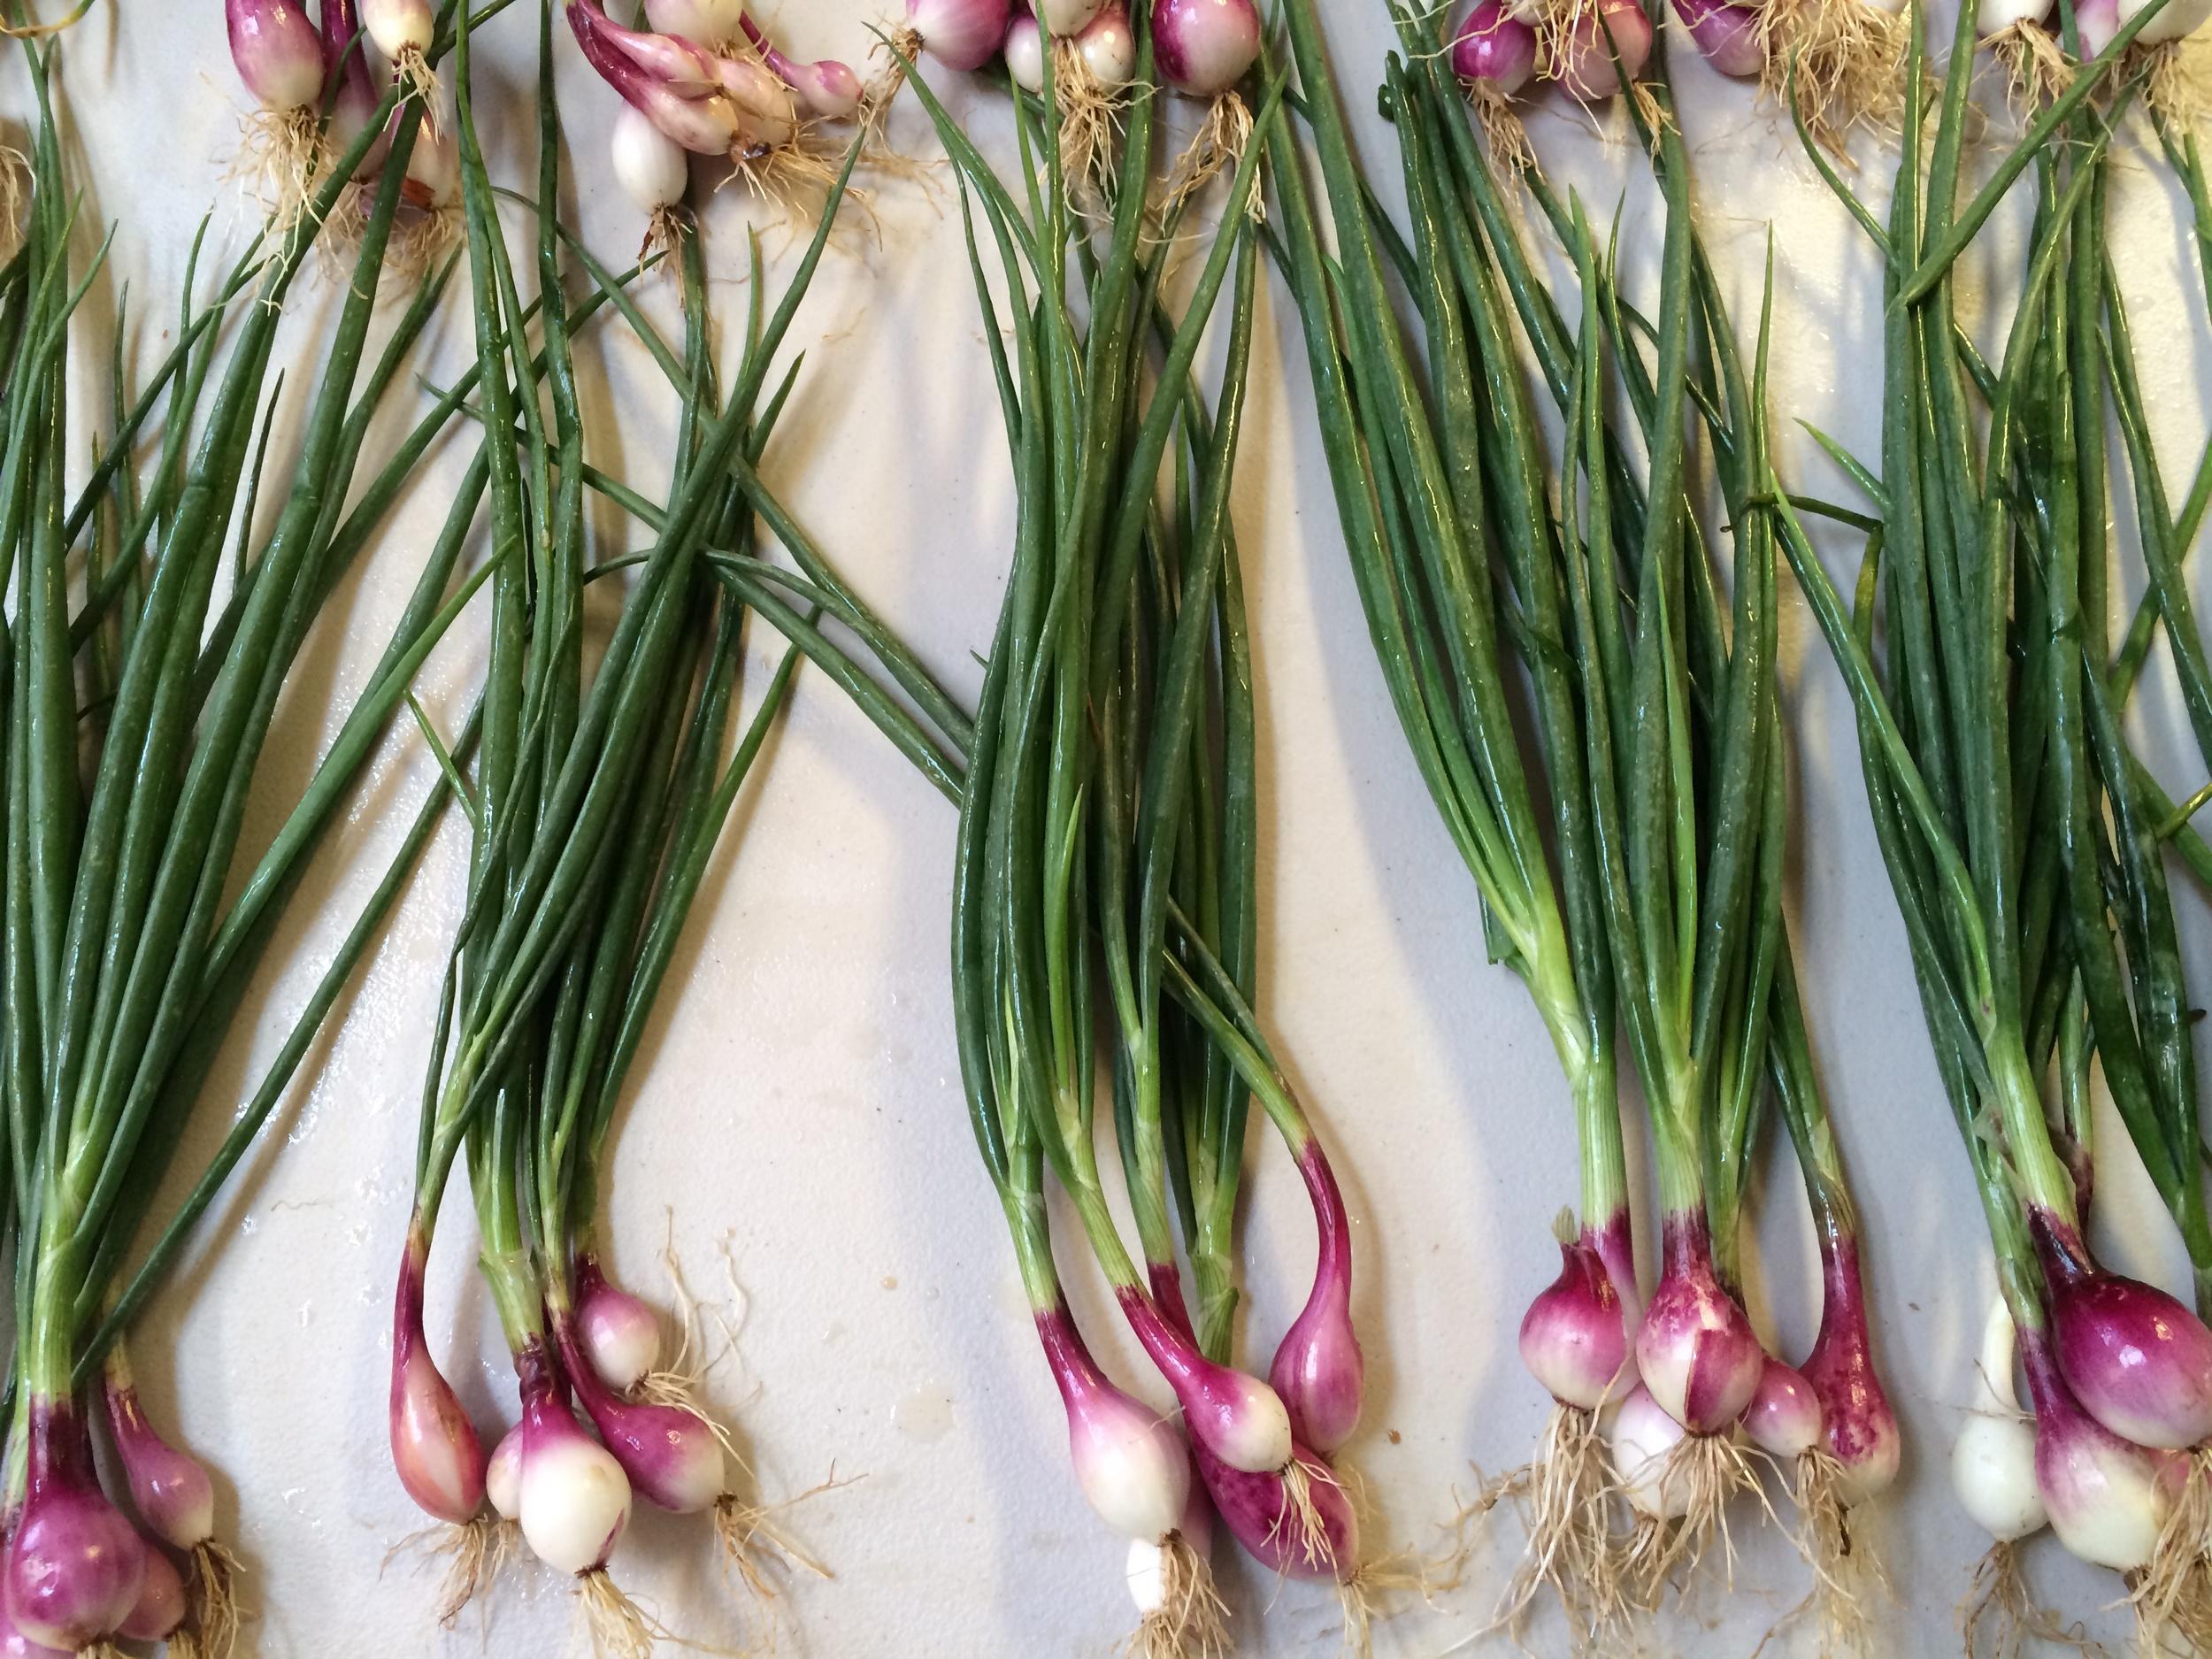 Beautiful Purplette bunching onions. So pretty & so tasty!